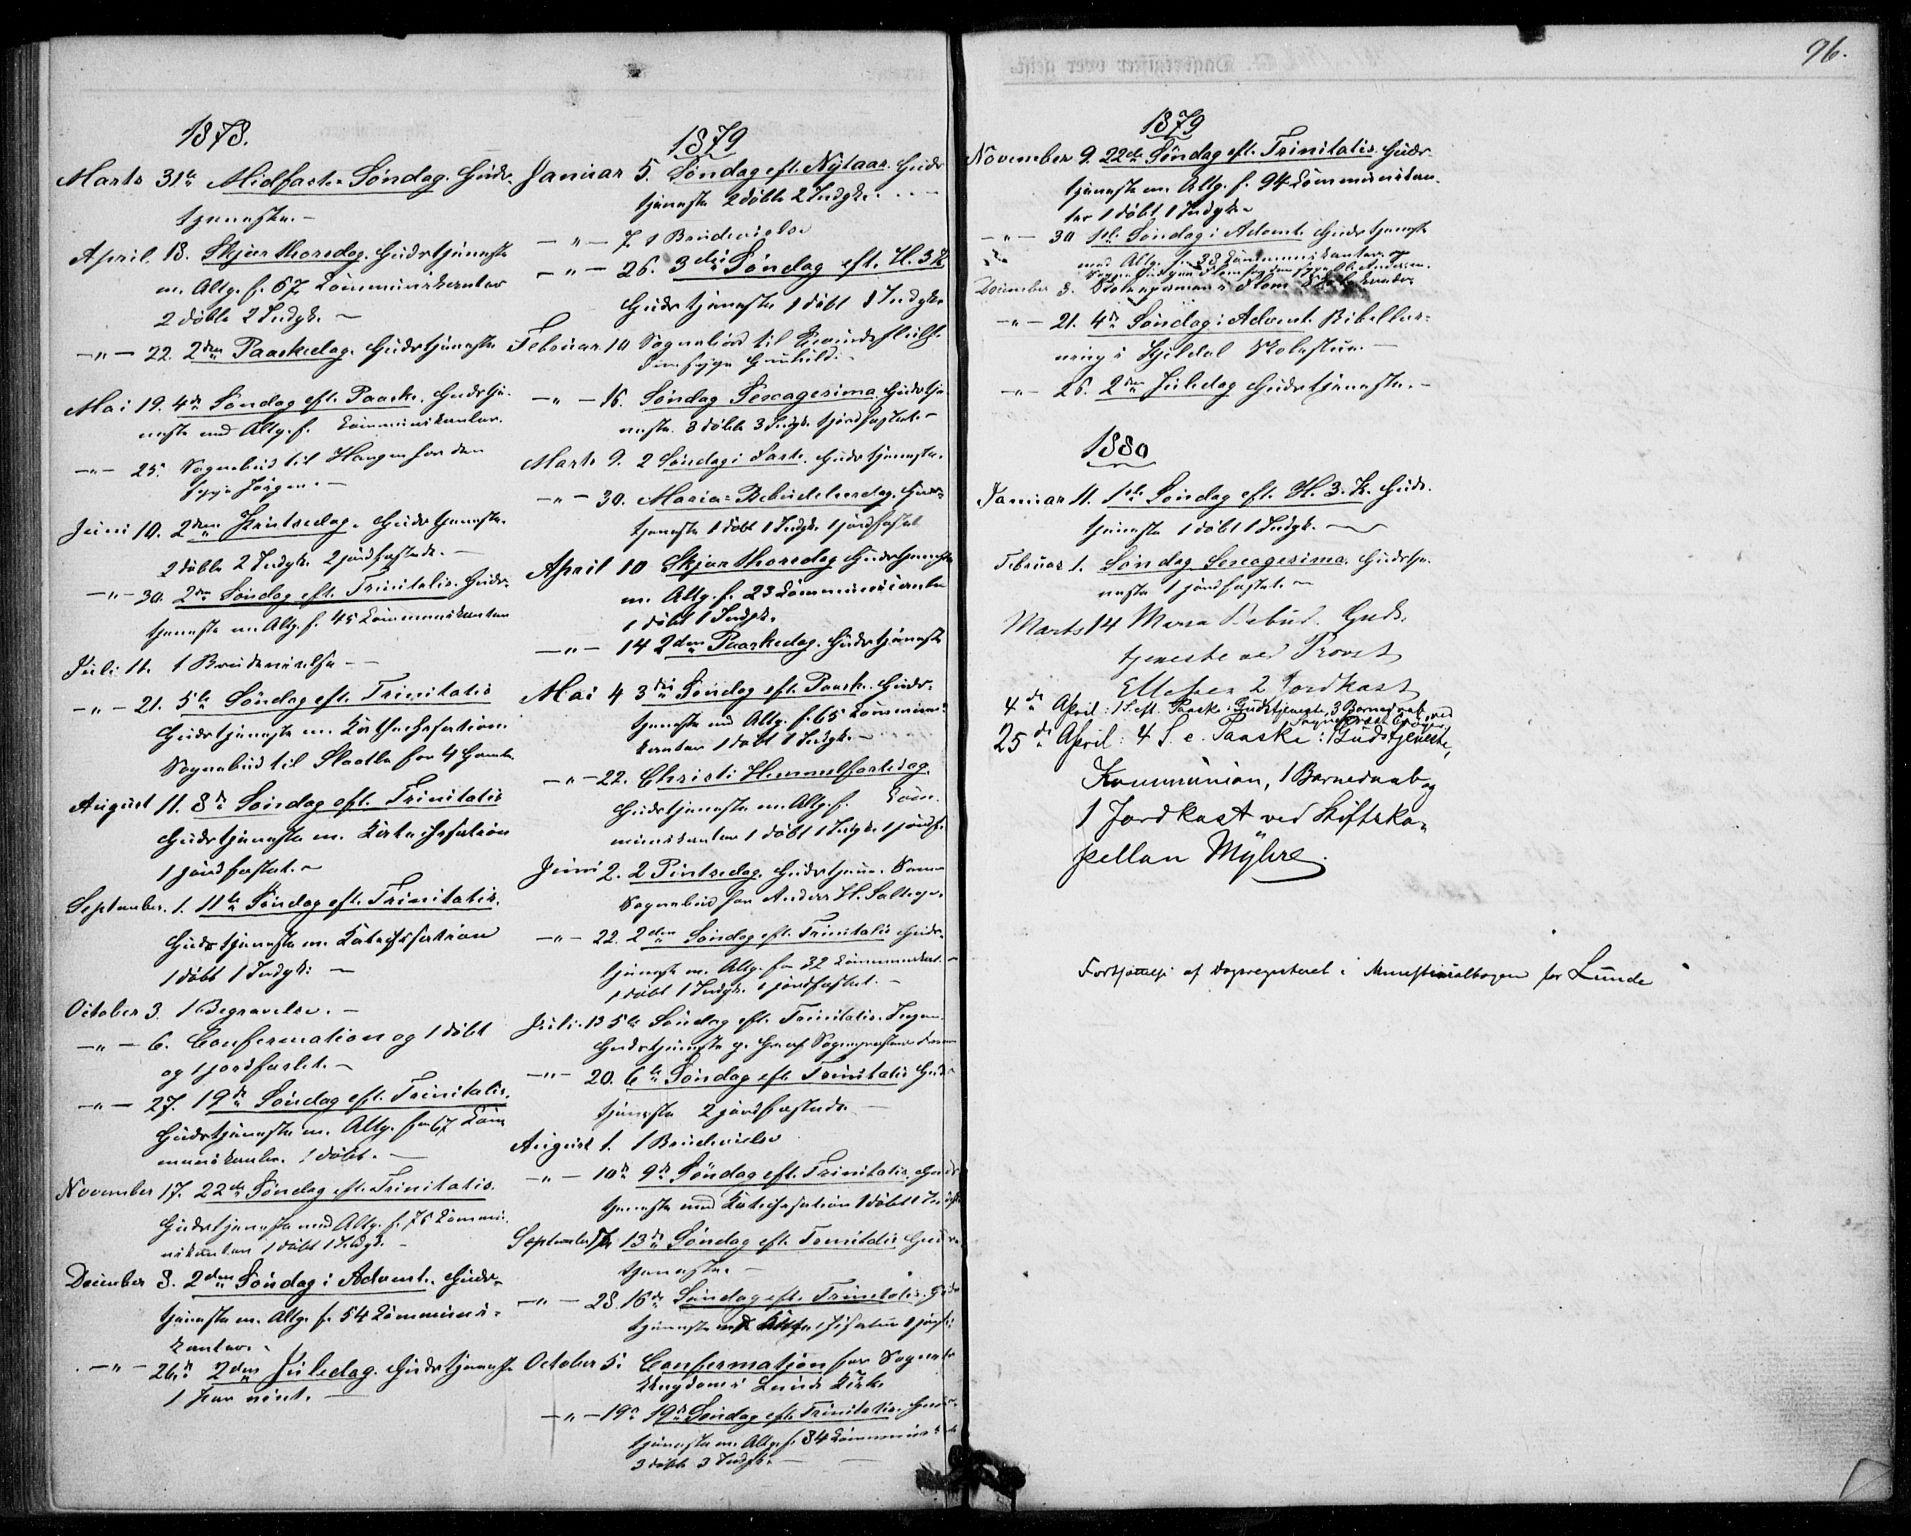 SAKO, Lunde kirkebøker, F/Fb/L0002: Ministerialbok nr. II 2, 1861-1881, s. 96